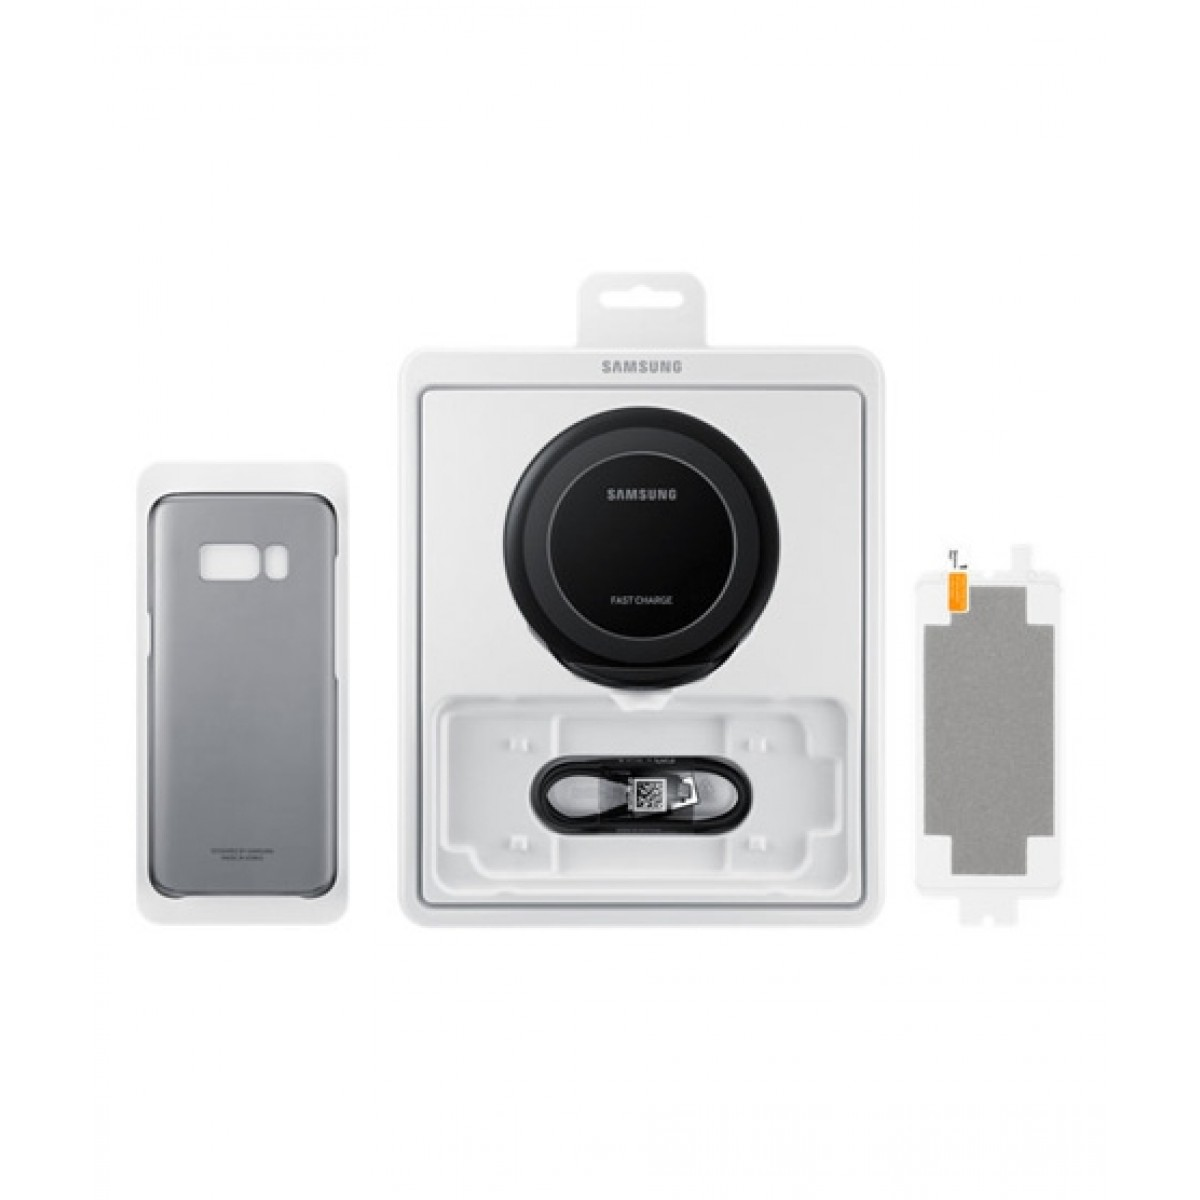 2afd9a4edcc9c4 Samsung Galaxy S8 Wireless Starter Kit Price in Pakistan | Buy Samsung  Galaxy S8 Wireless Starter Kit | iShopping.pk